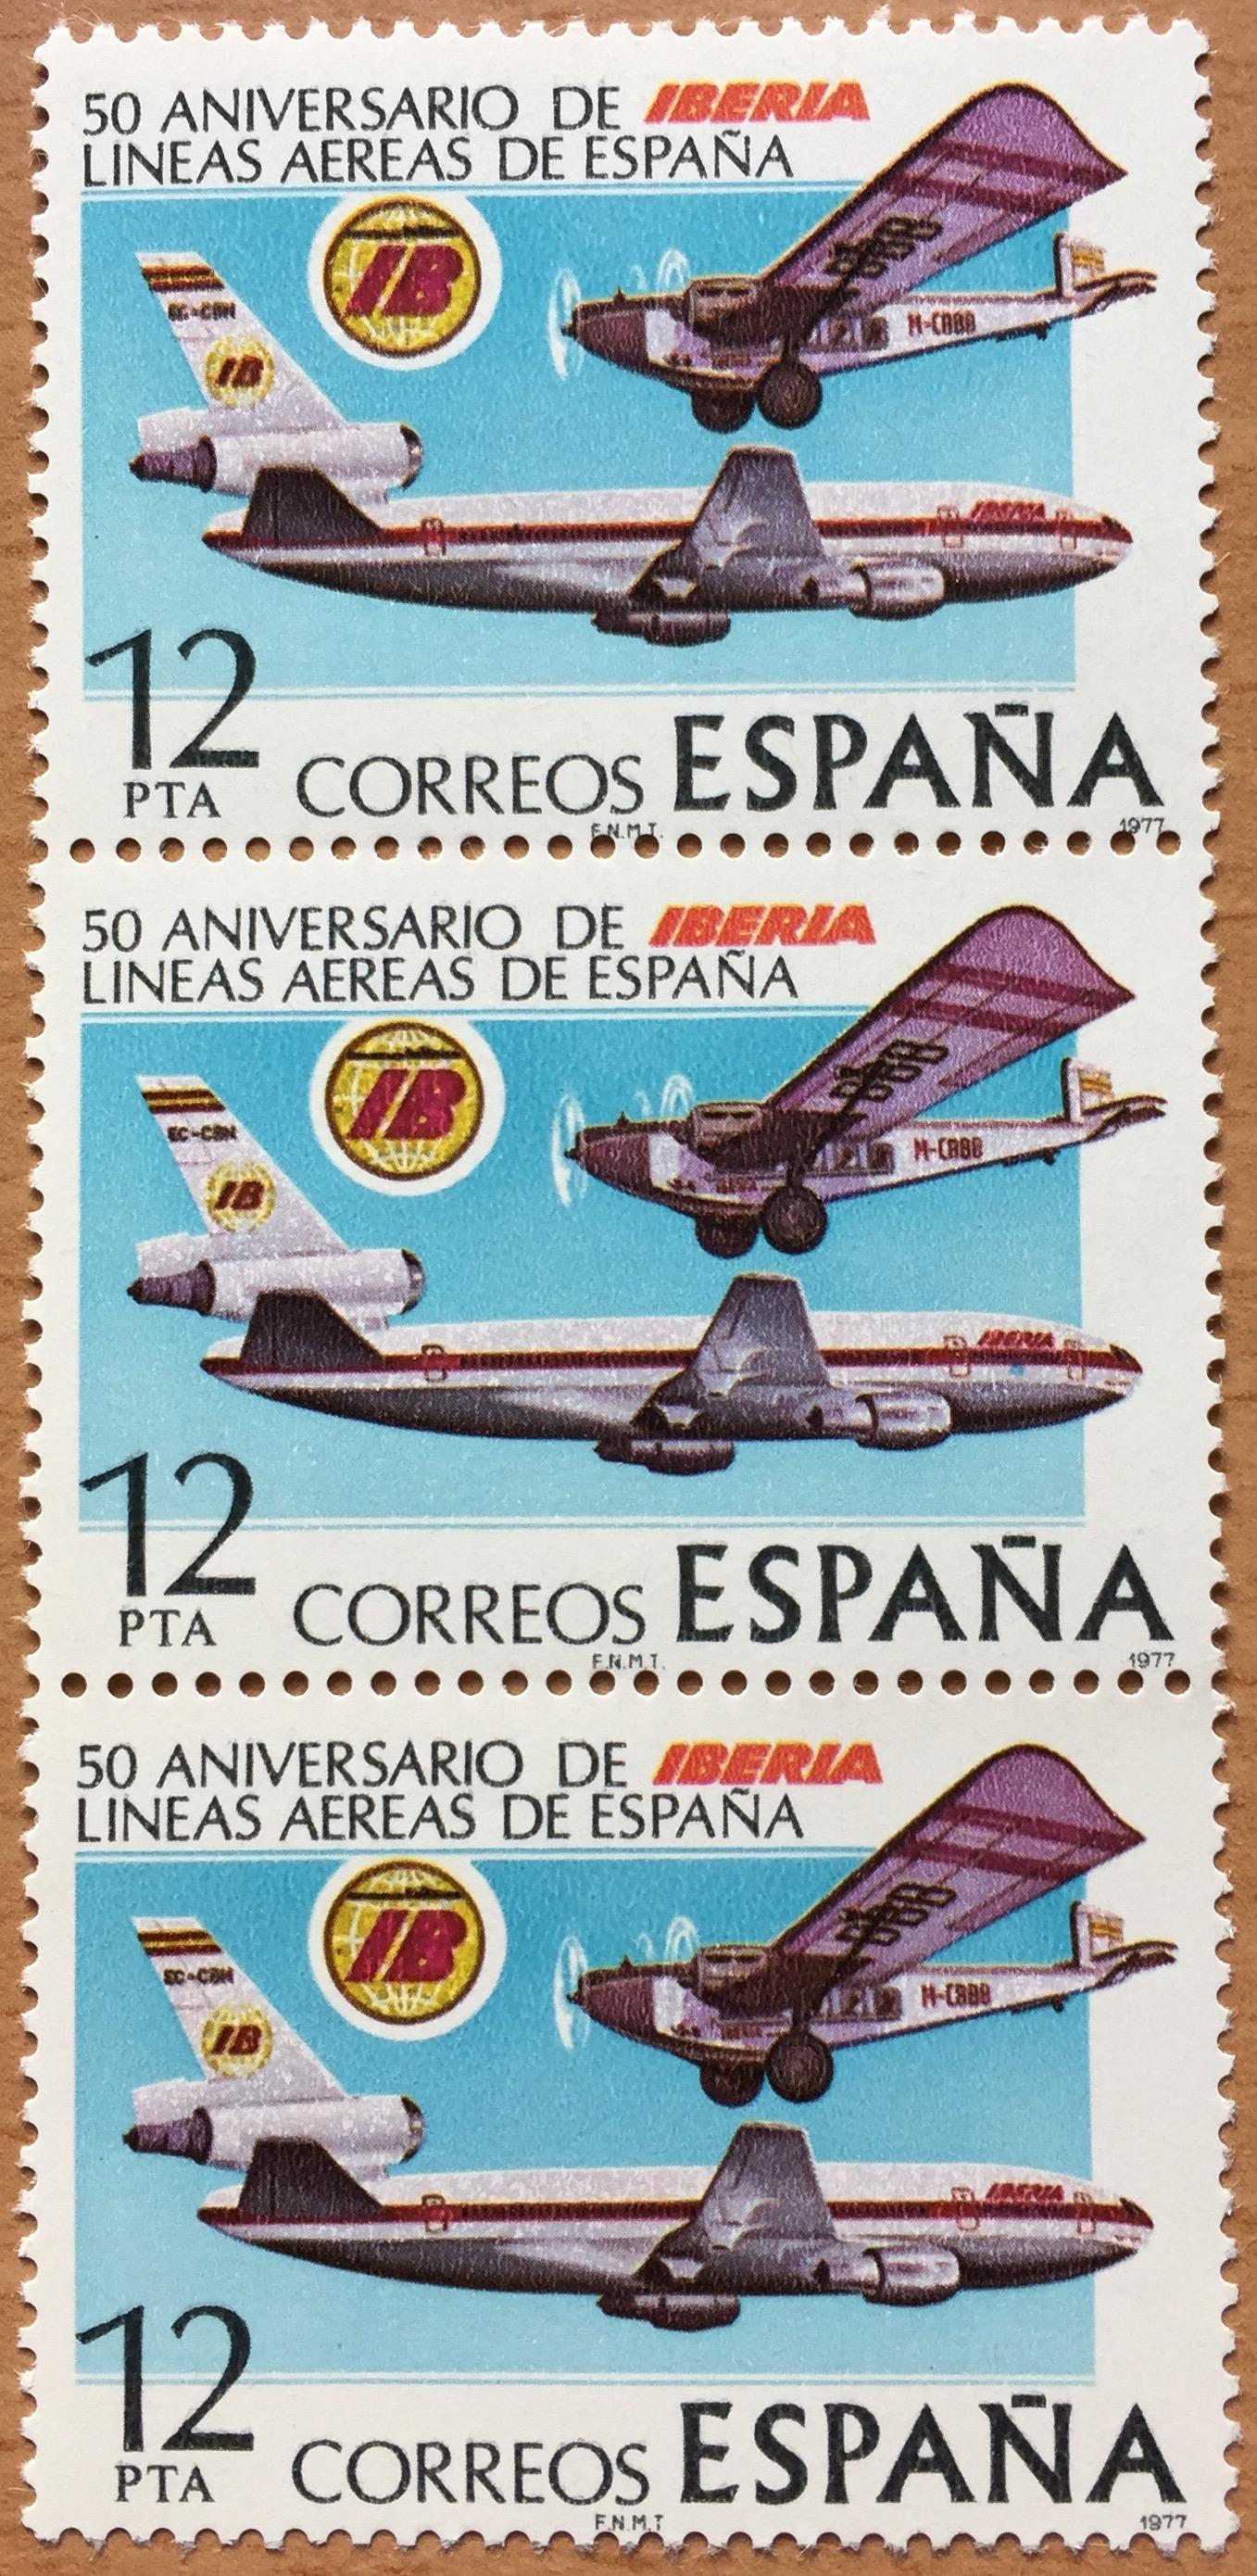 "Iberia's 50th Anniversary, Spanish post, ""Correos"", stamp, 1977"